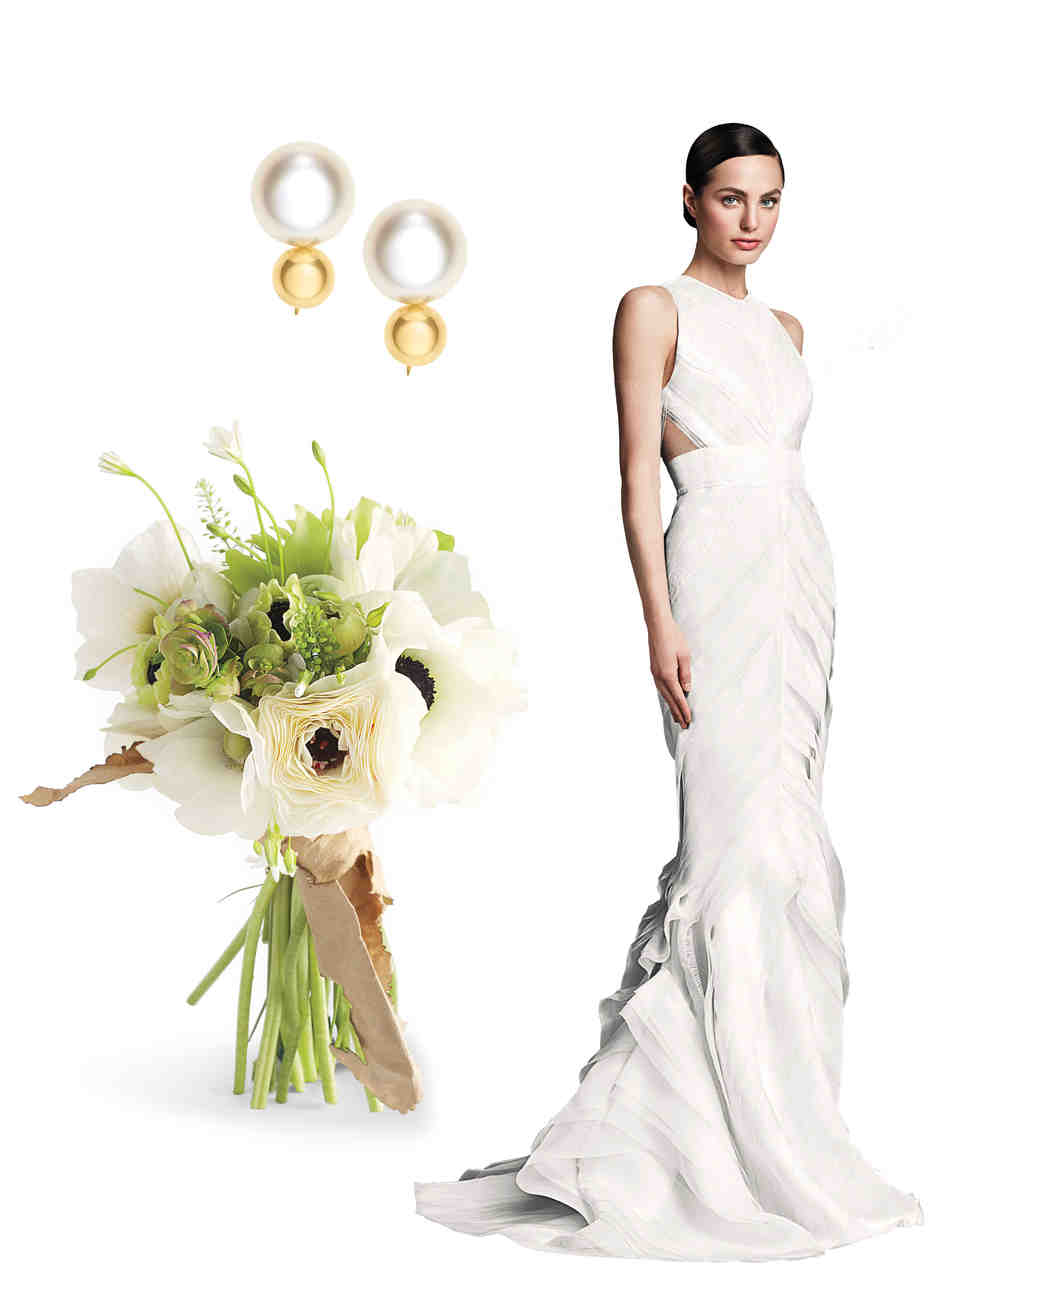 taylor-tomasi-hill-bouquets-modern-minimalism-0914.jpg